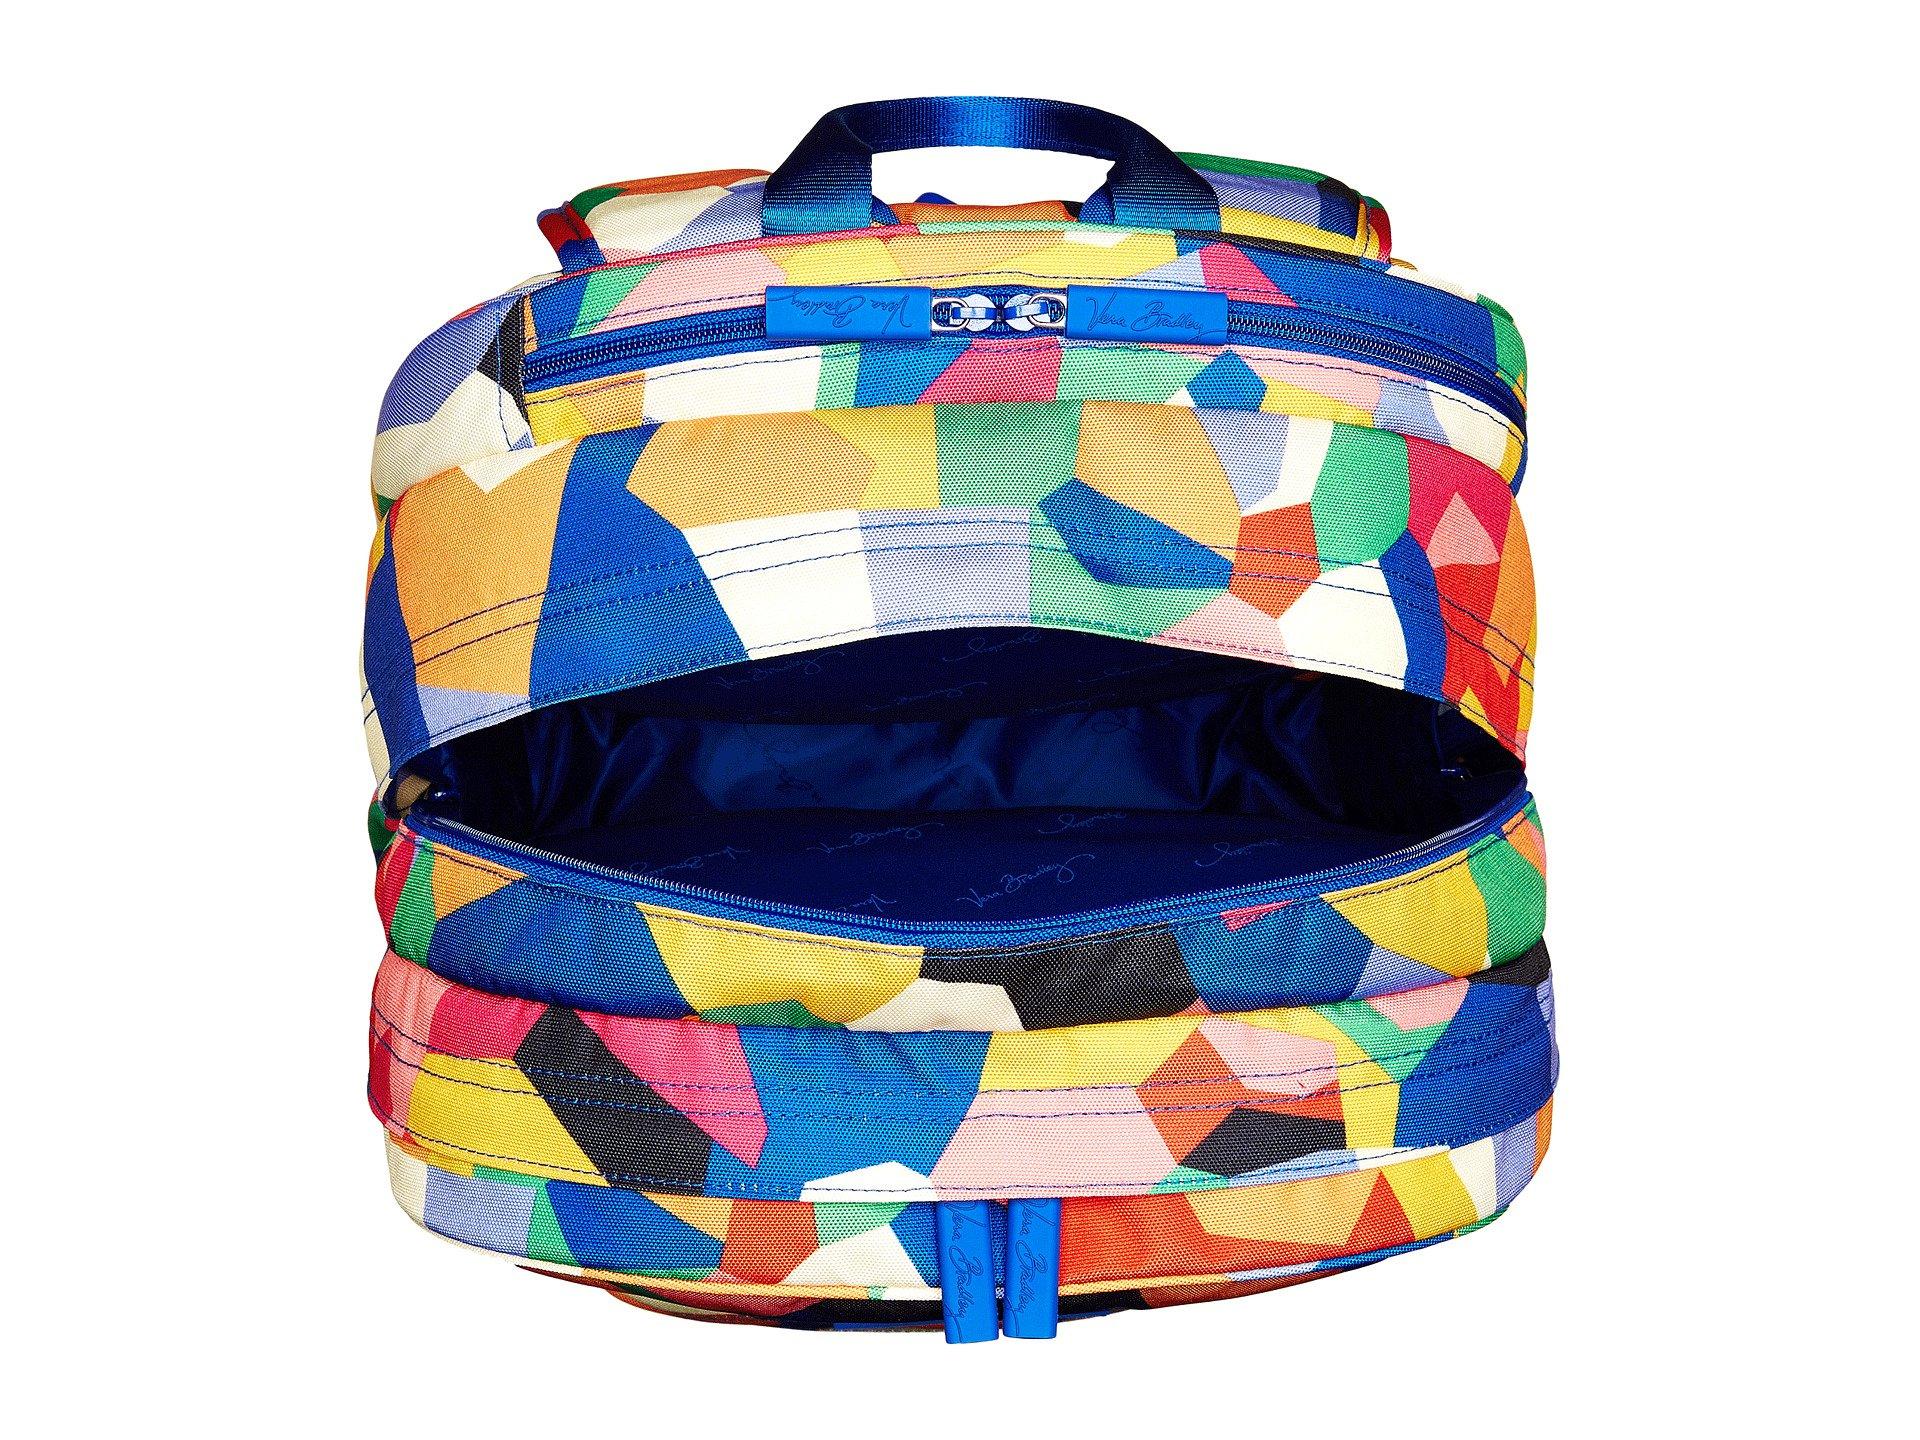 fe0b58959 Vera Bradley Lighten Up Grande Laptop Backpack in Blue - Lyst